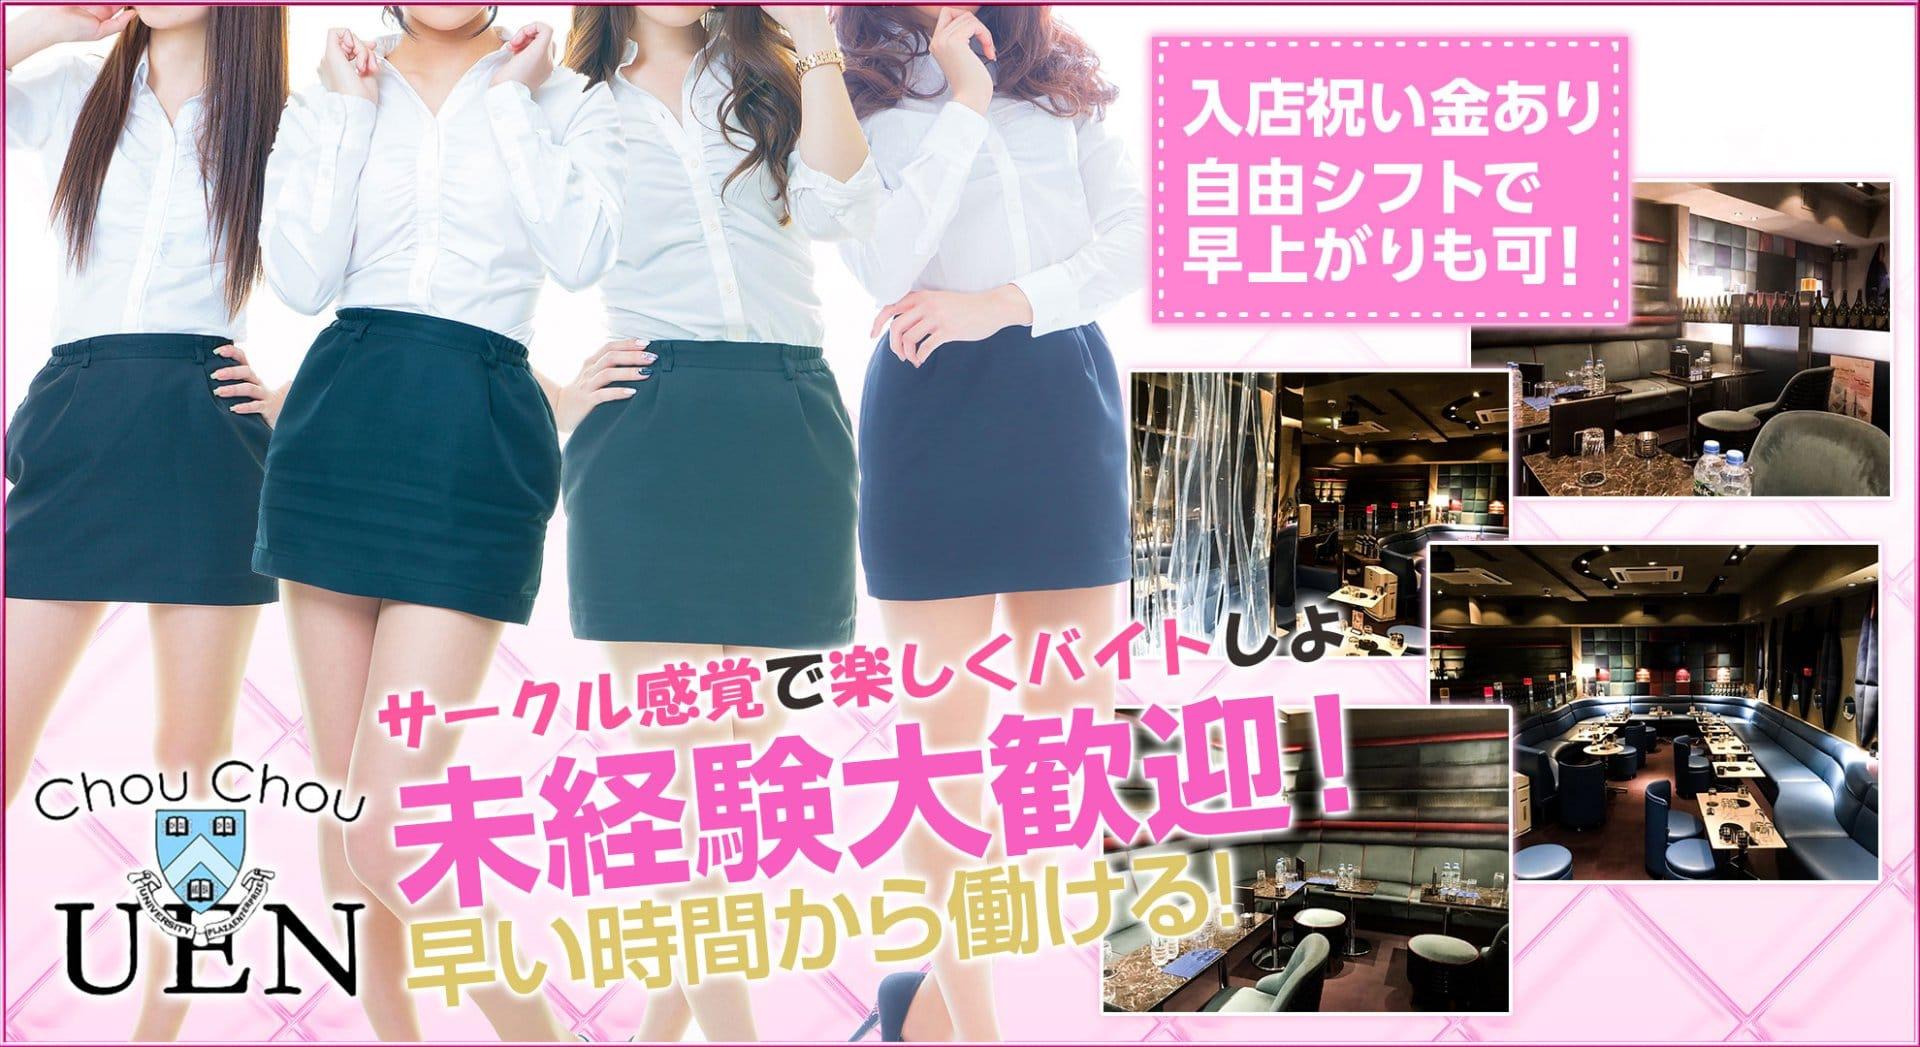 Chou Chou(シュシュ)上野店 TOP画像